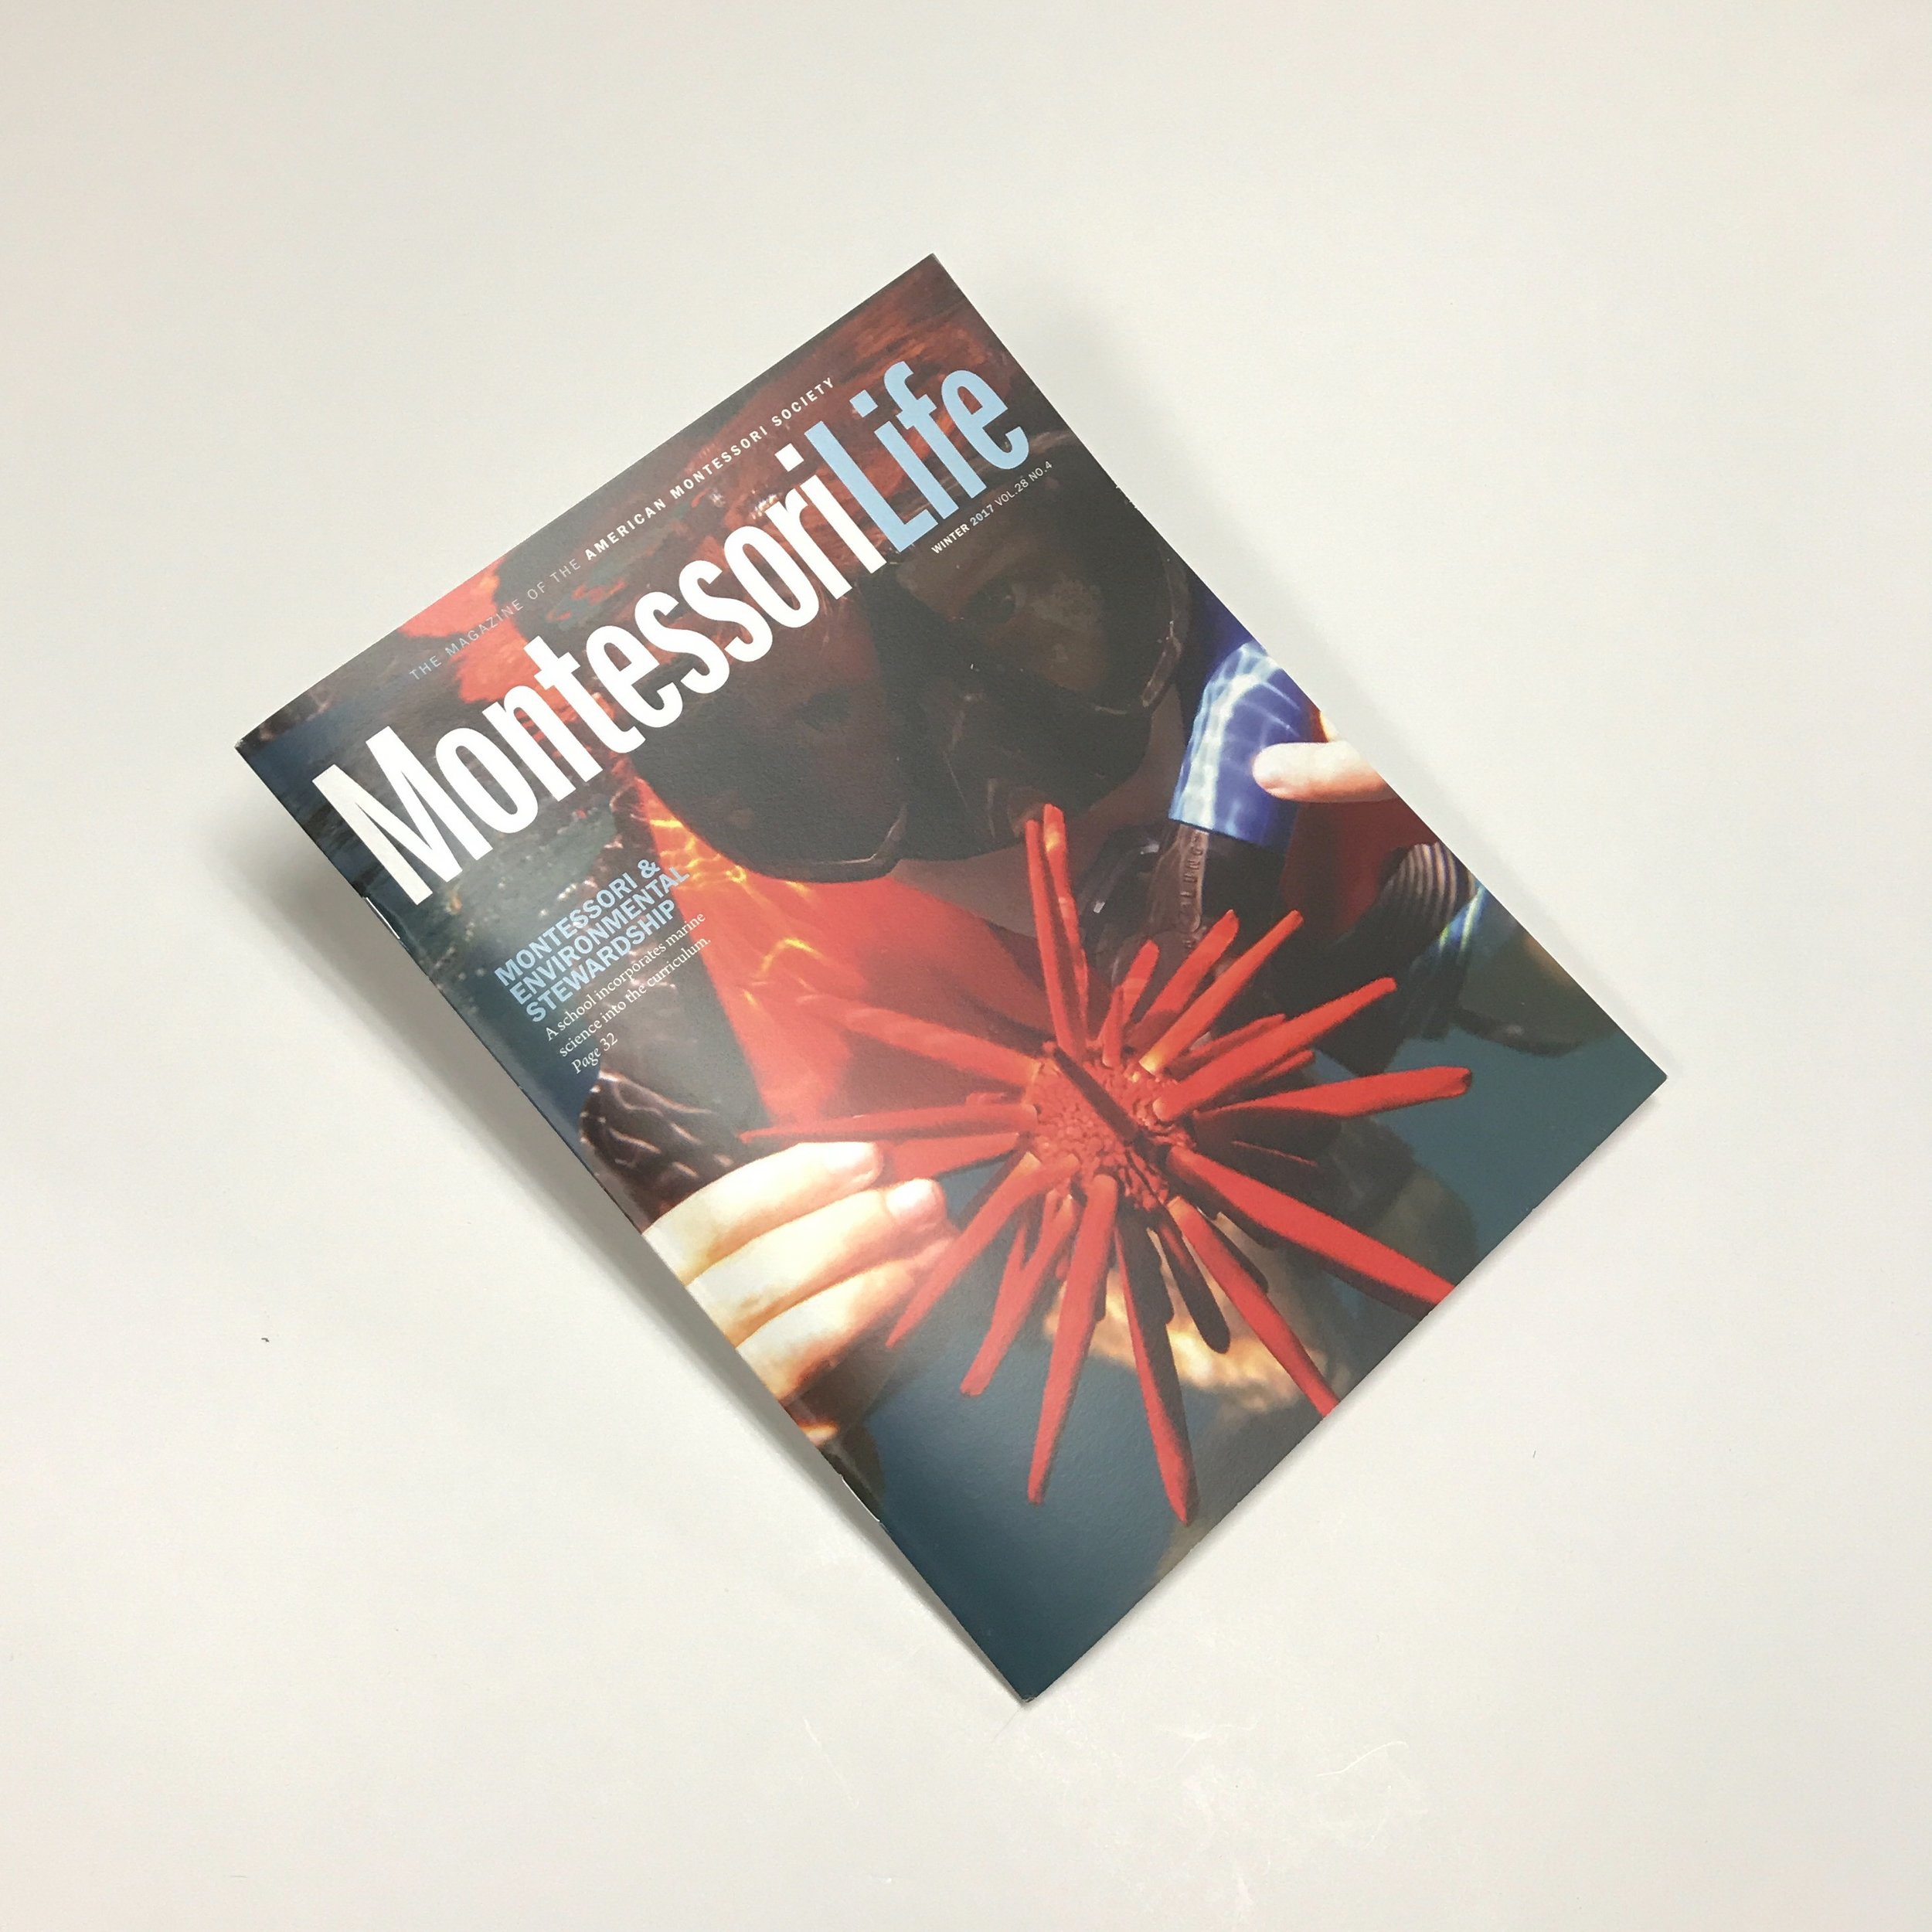 Booklet-Montessori-Anderberg-Innovative-Print Solutions-Twin-Cities.JPG